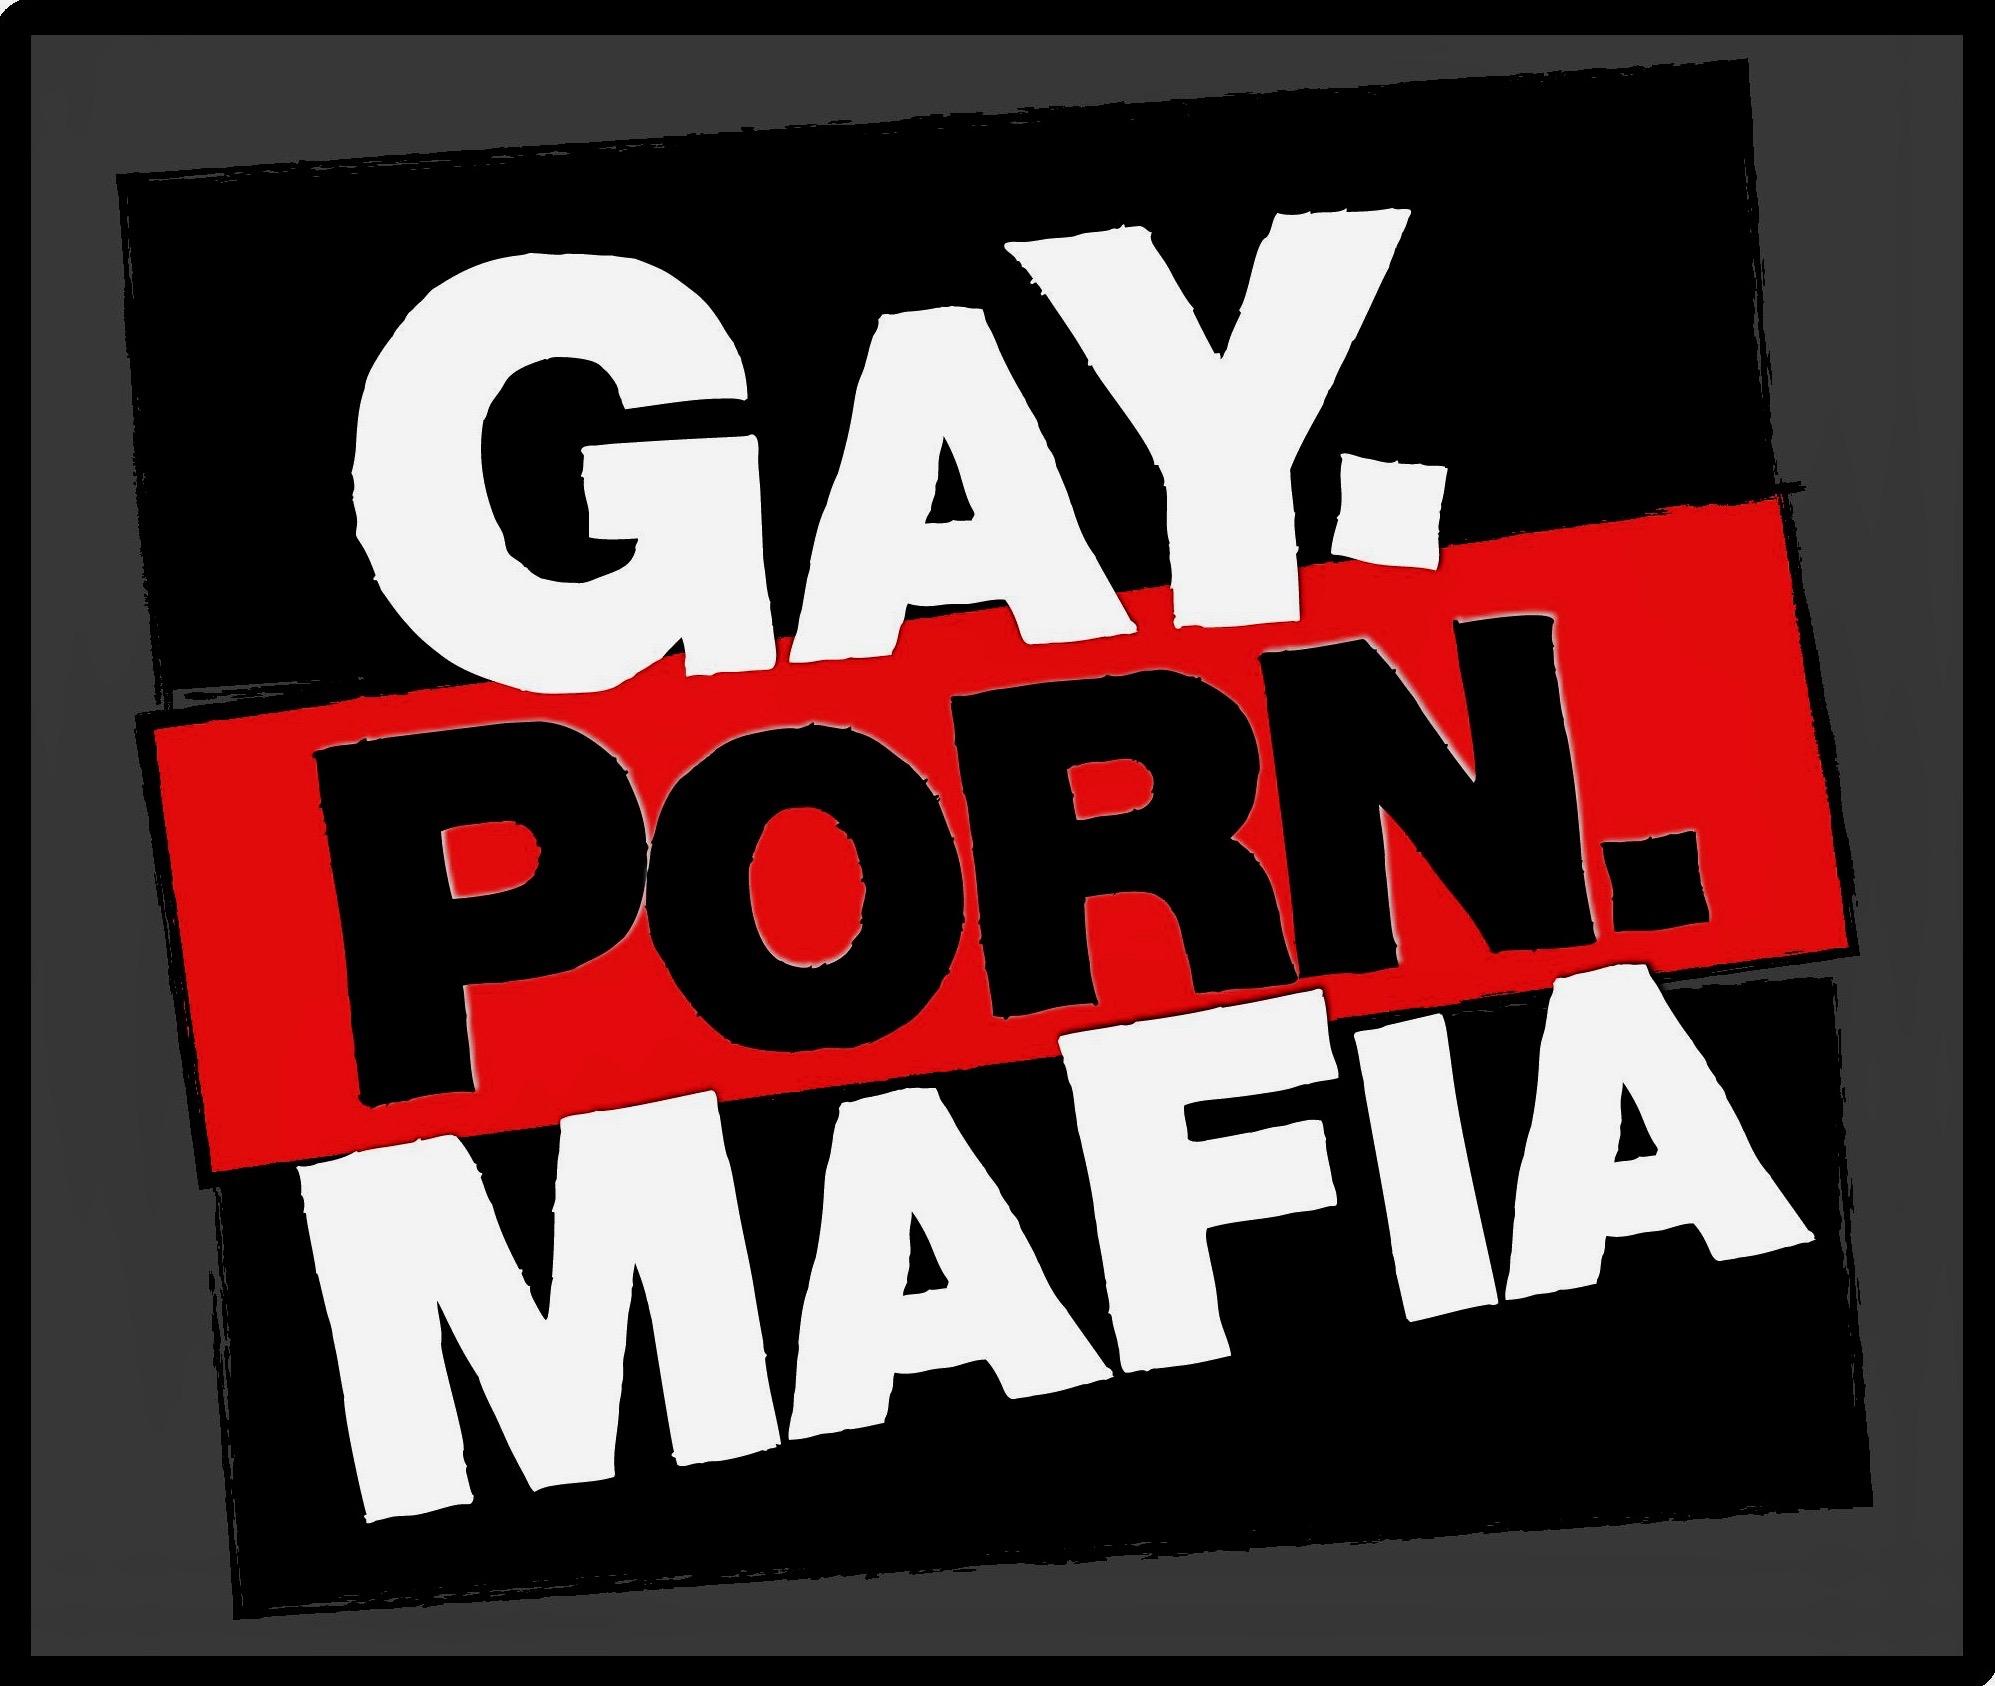 GAY PORN MAFIA LOGO OFFICIAL.jpg